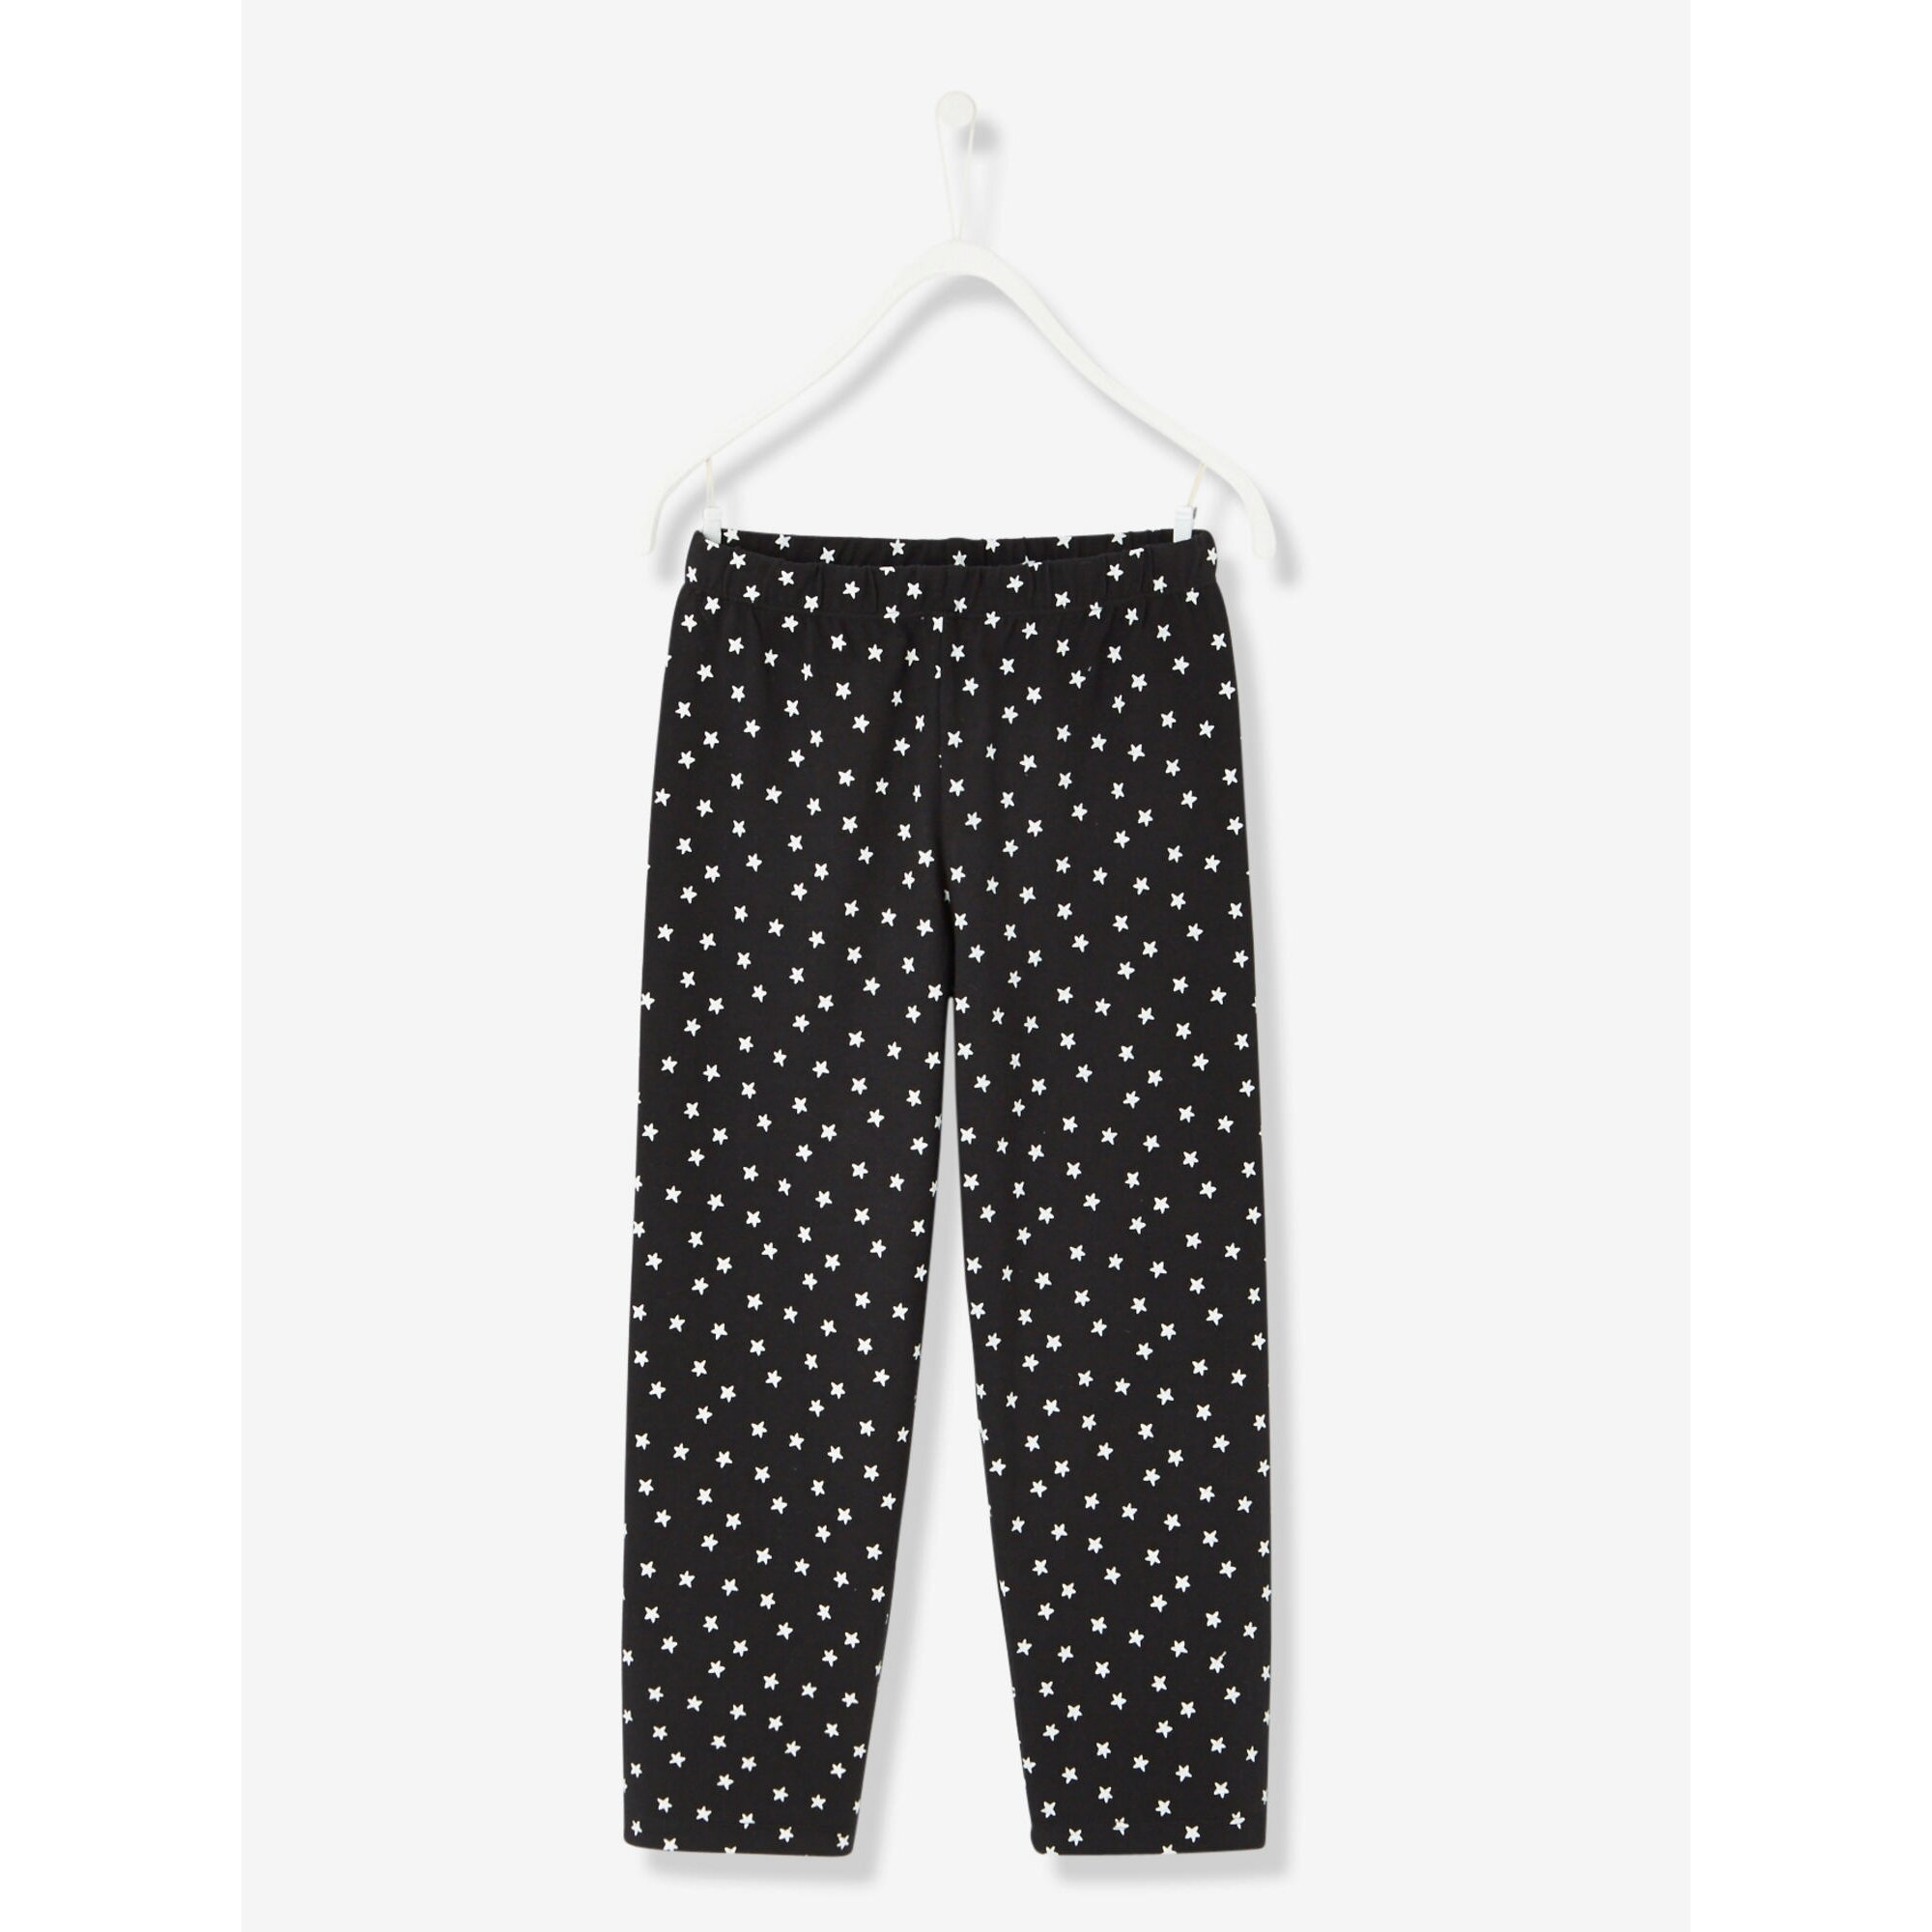 vertbaudet-jersey-pyjama-fur-madchen, 25.99 EUR @ babywalz-de